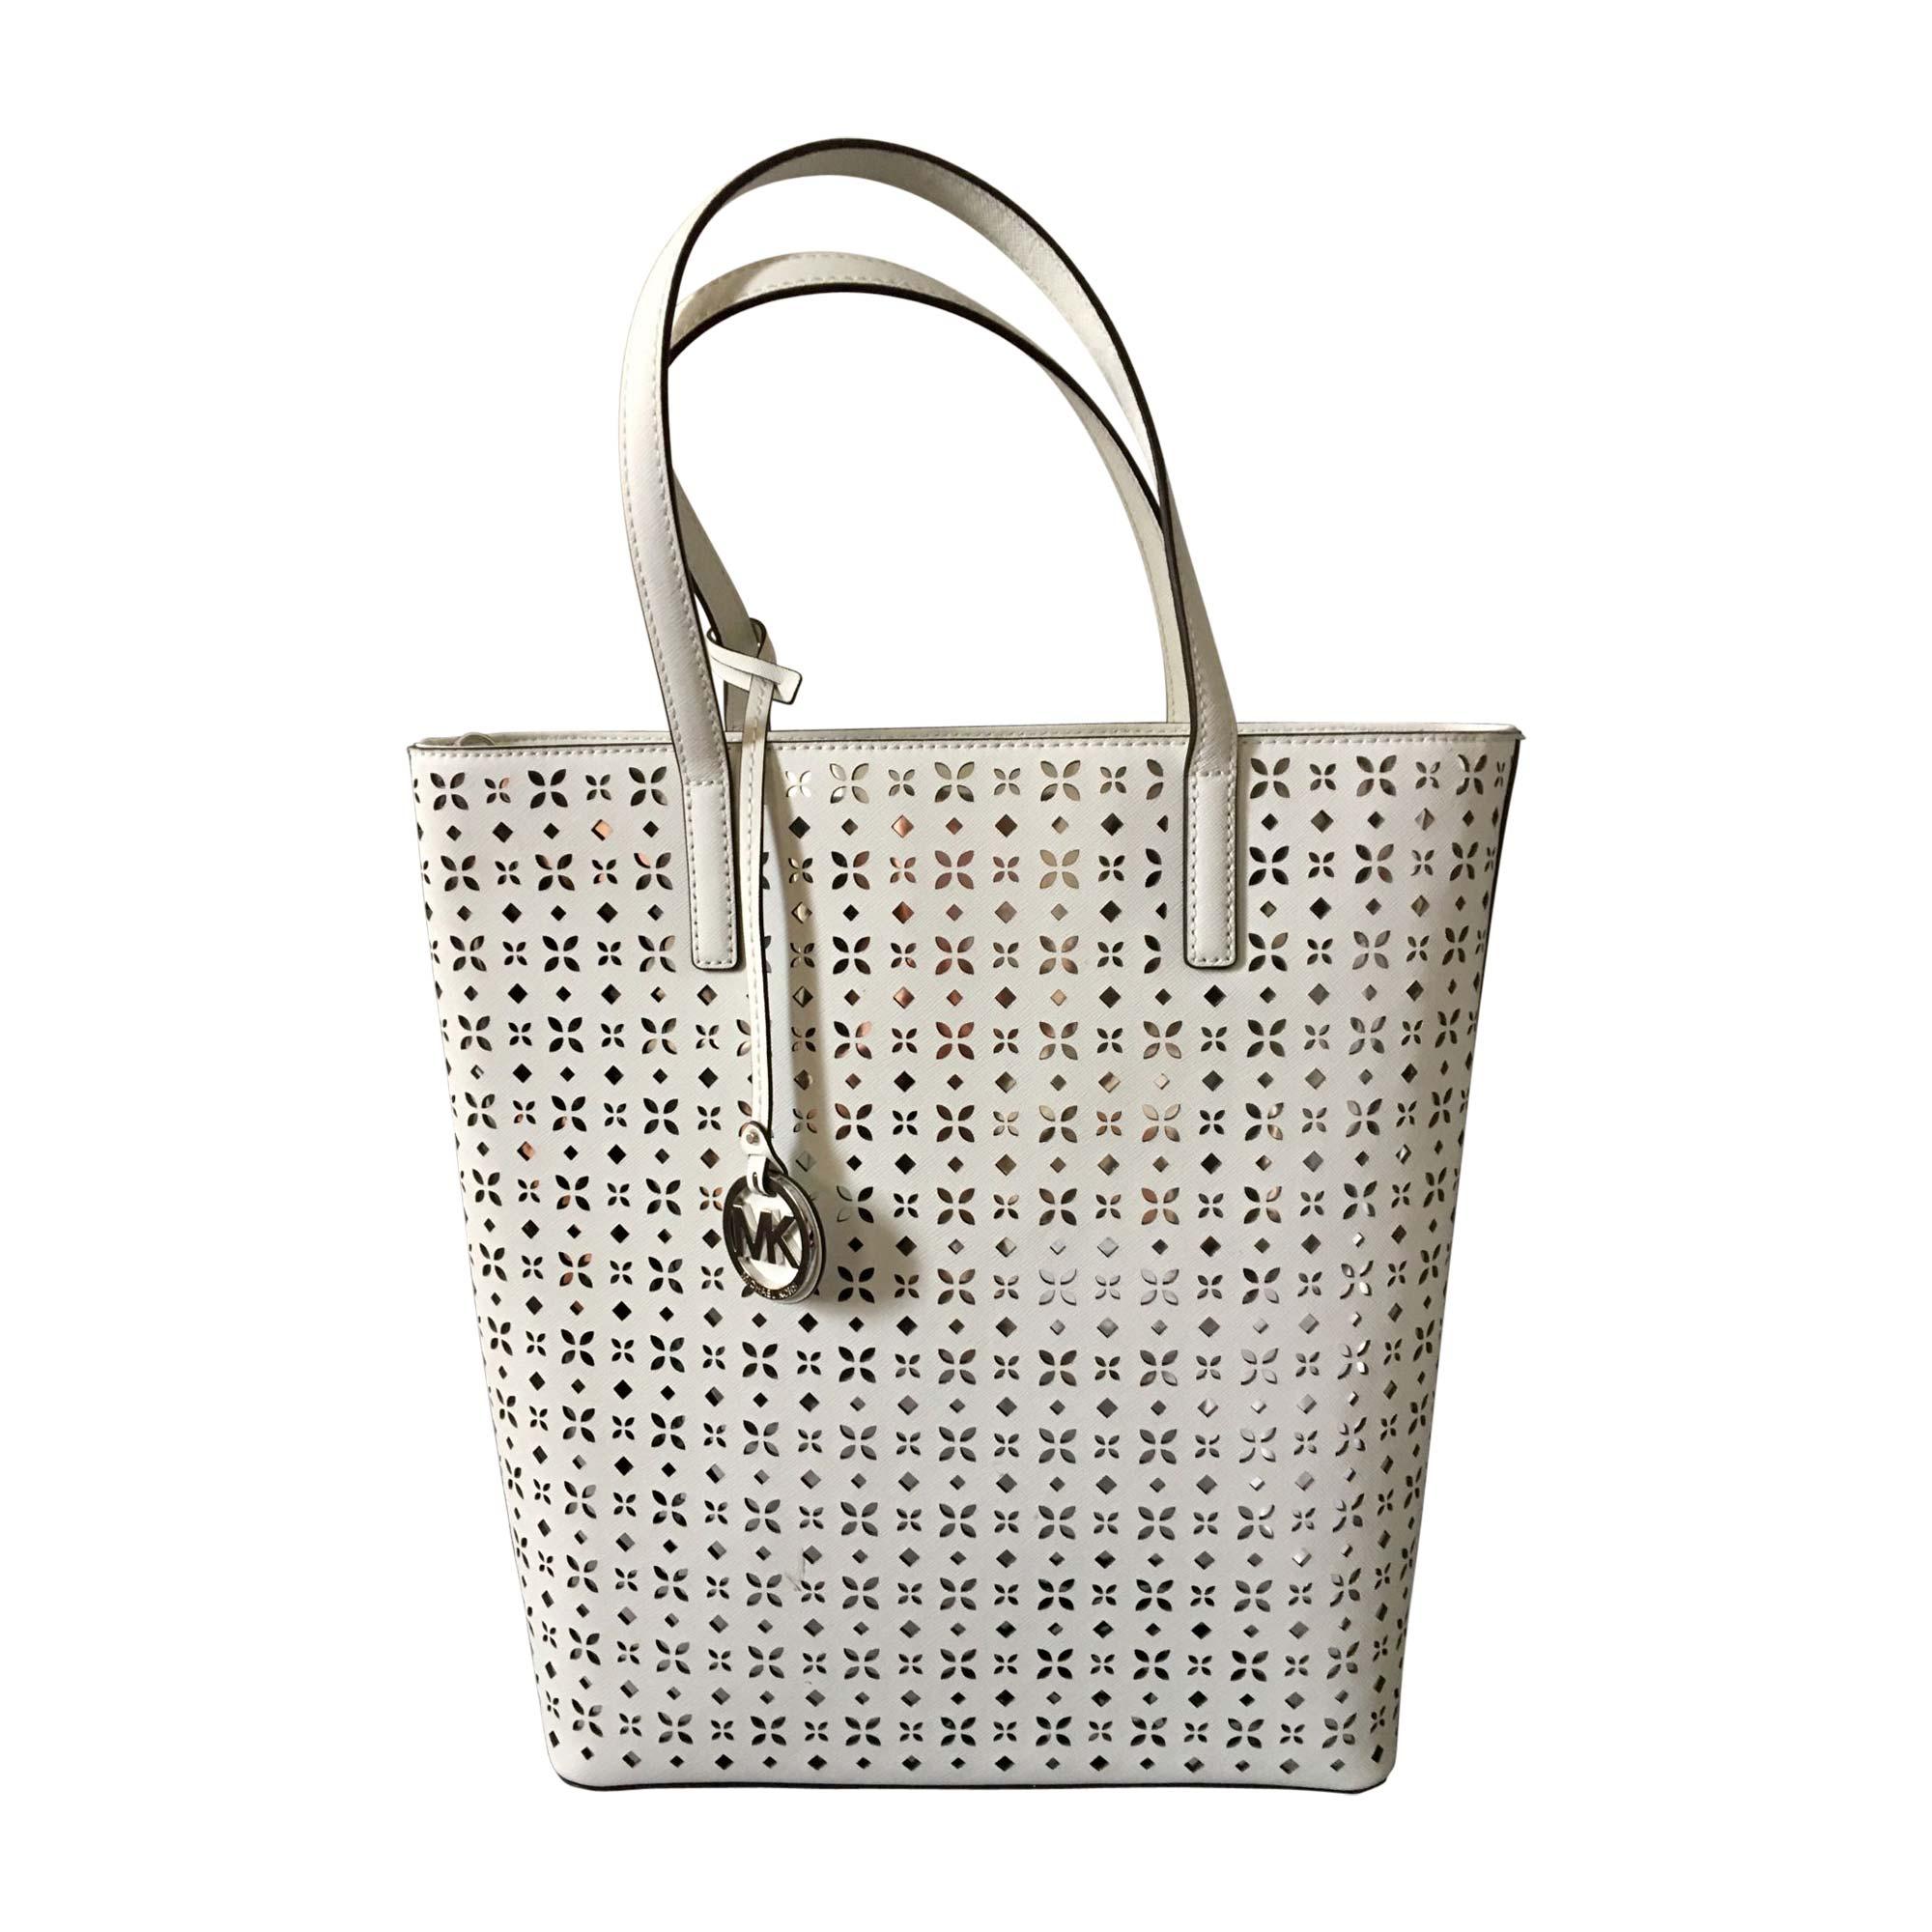 Leather Handbag MICHAEL KORS White, off-white, ecru